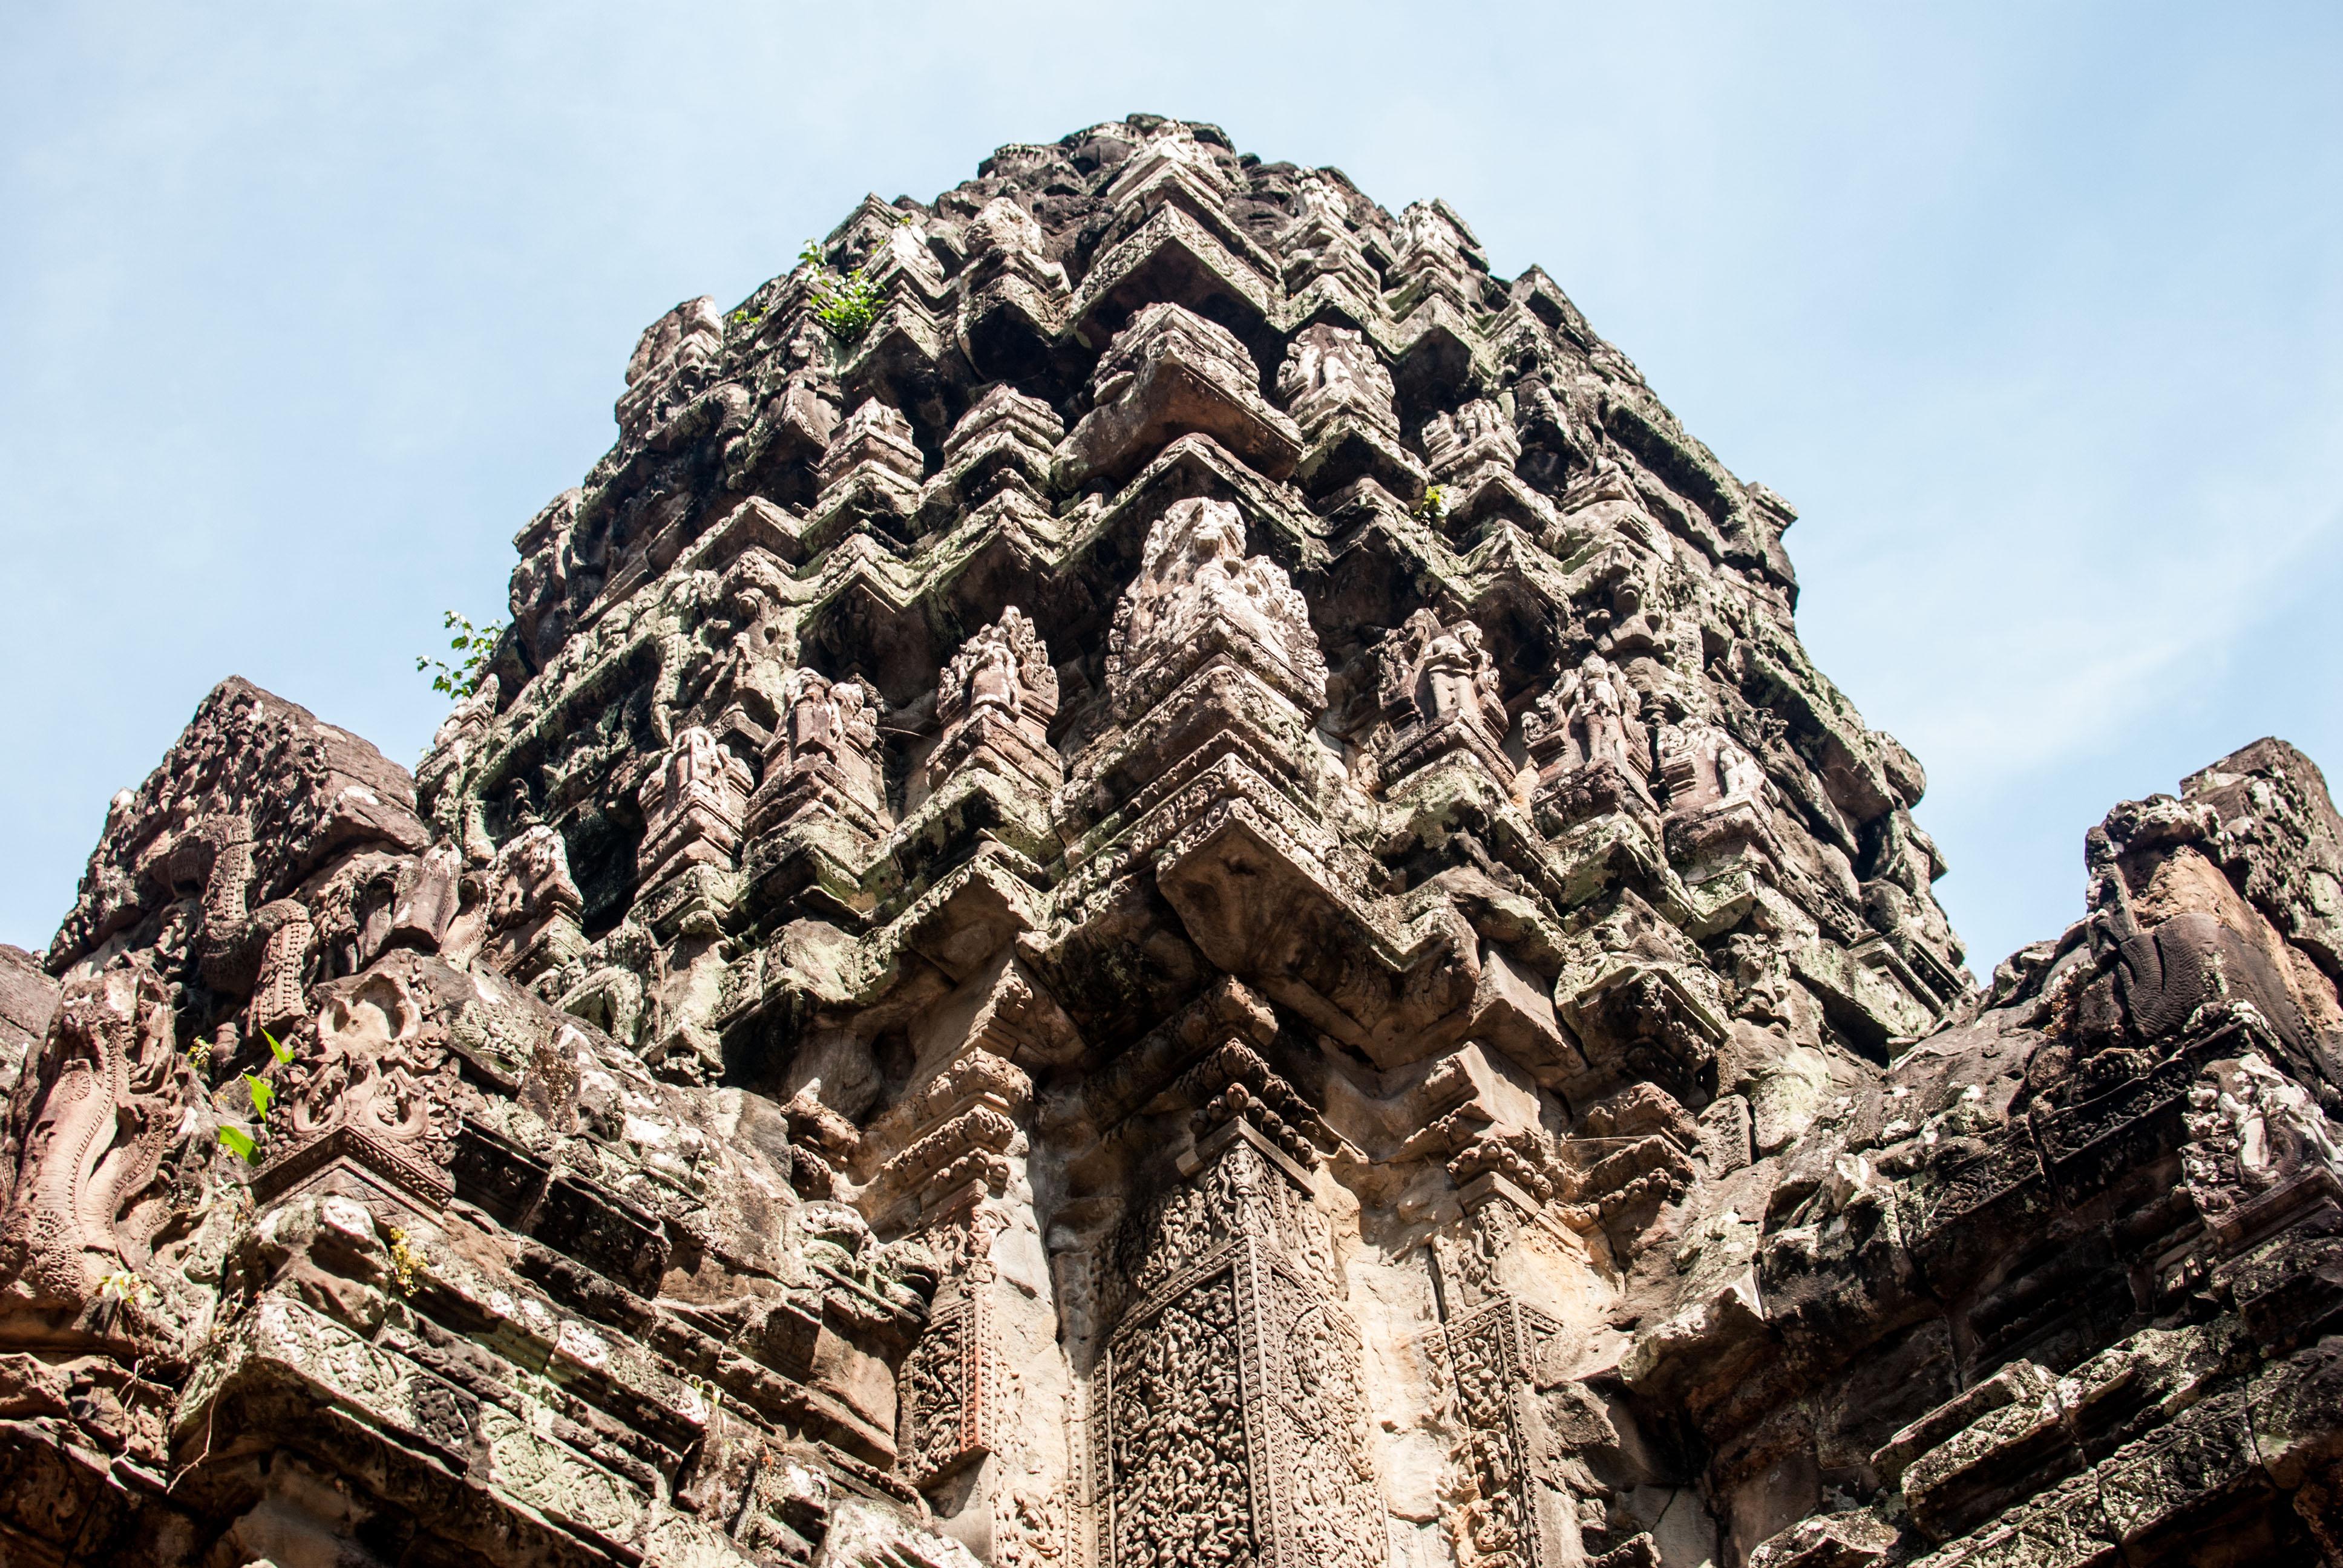 The corn spire on Thommanon Temple